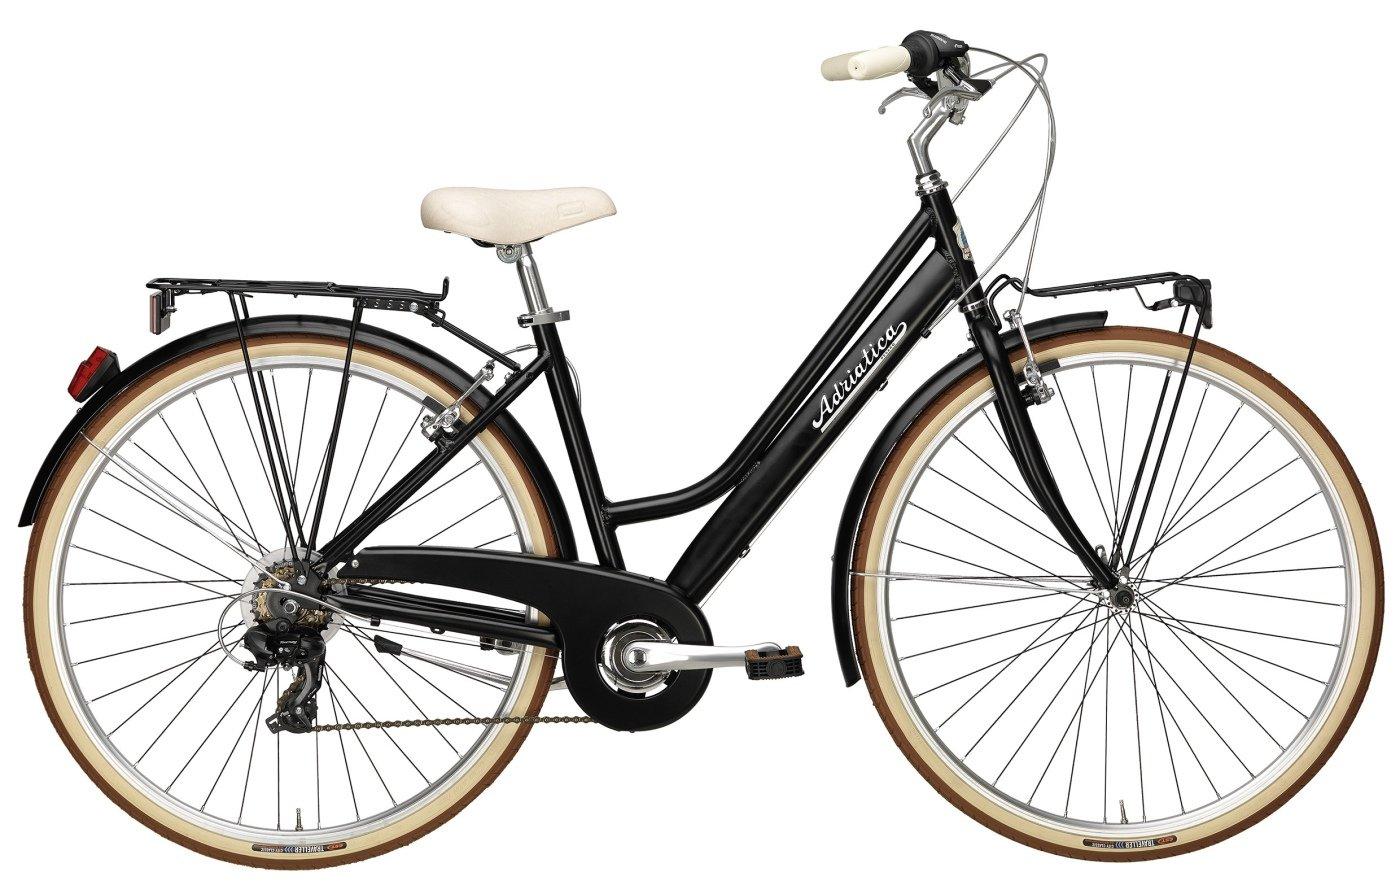 Adriatica Bicicleta Clasica Mujer- Retro 28